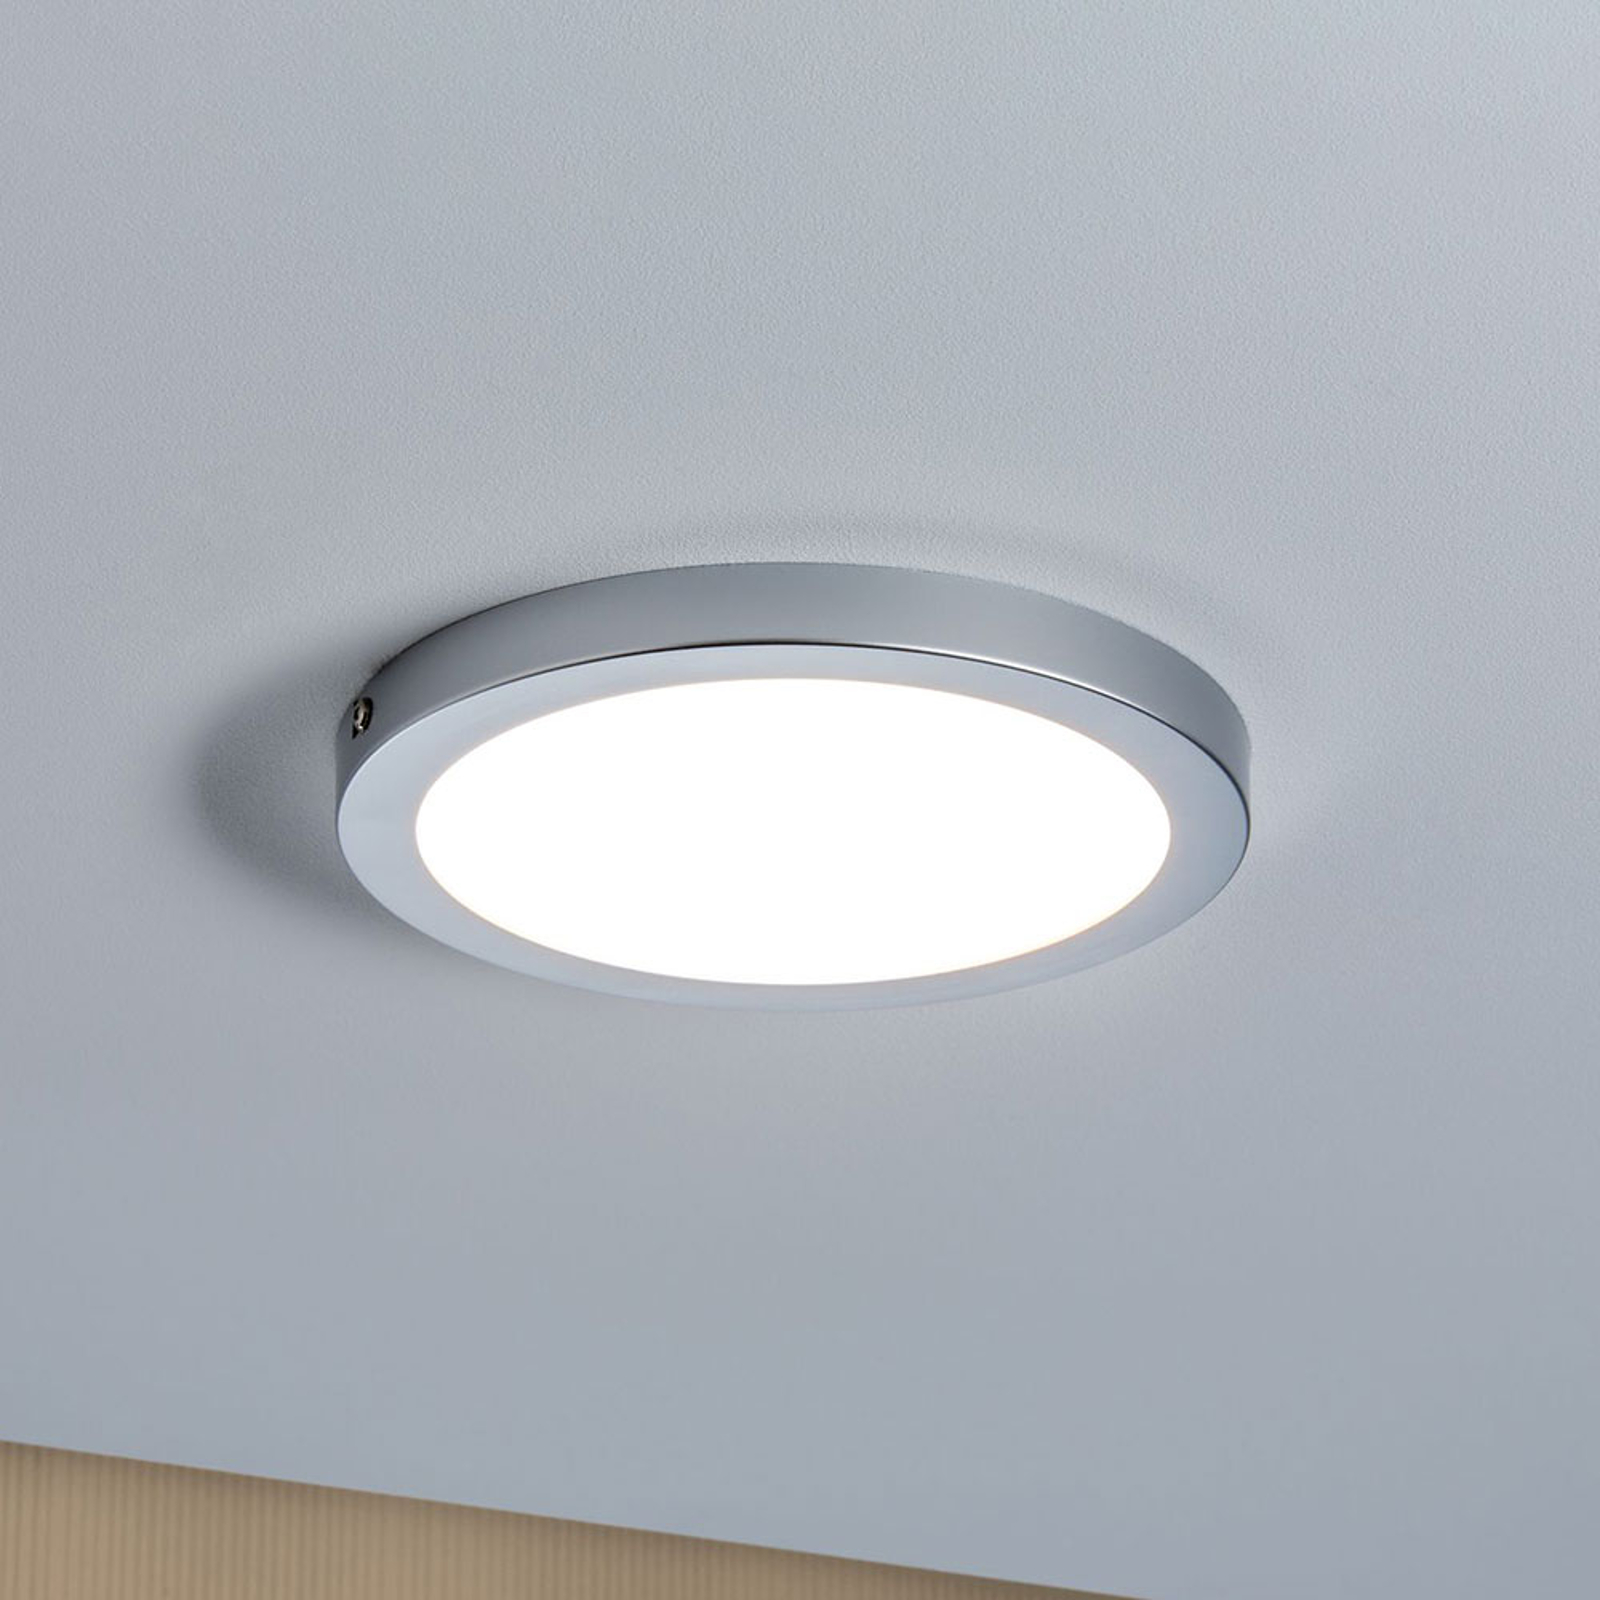 Paulmann Atria lampa sufitowa LED Ø 22cm chrom